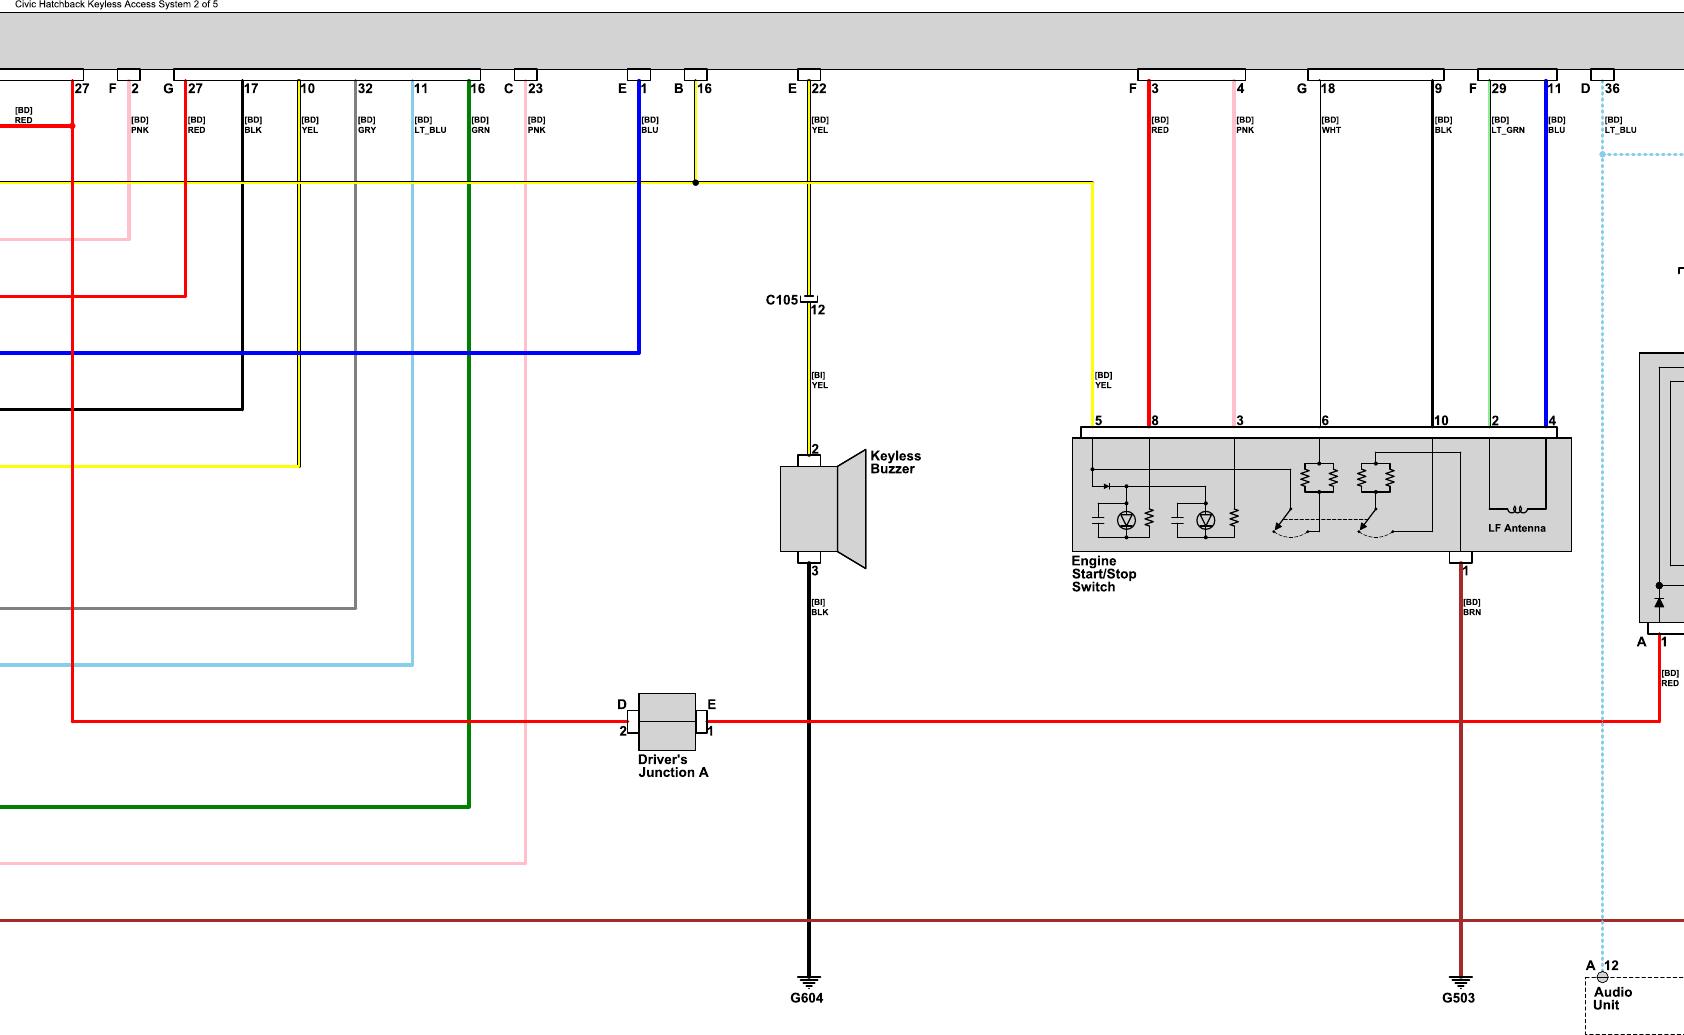 Electrical Wiring Diagrams page 87 | 2016 CIVIC Workshop ...